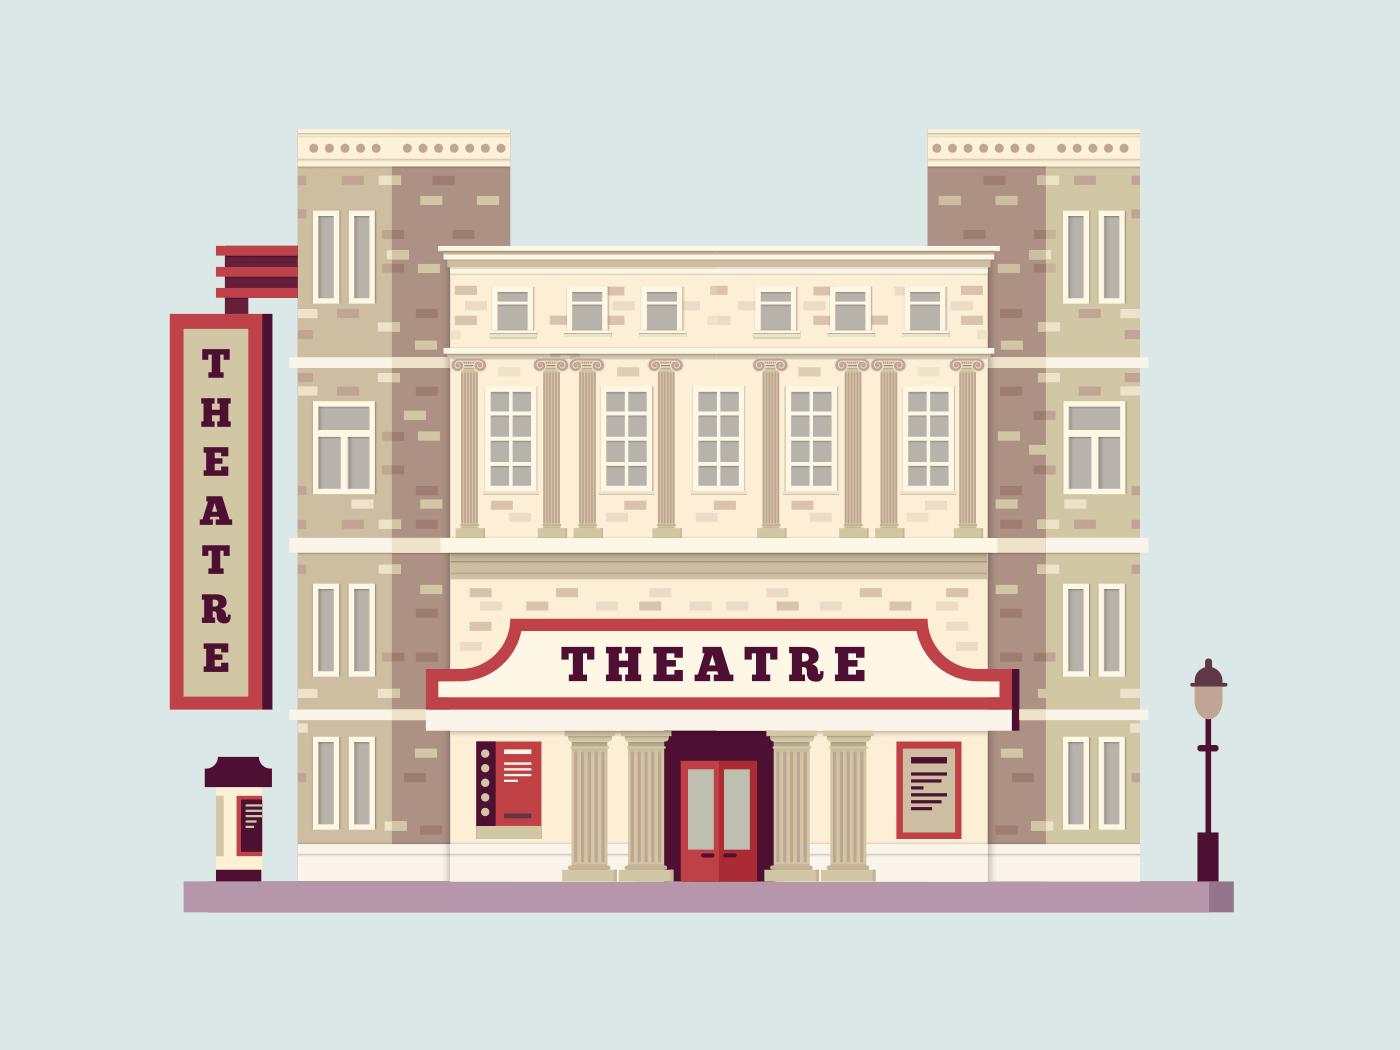 Theater building illustration